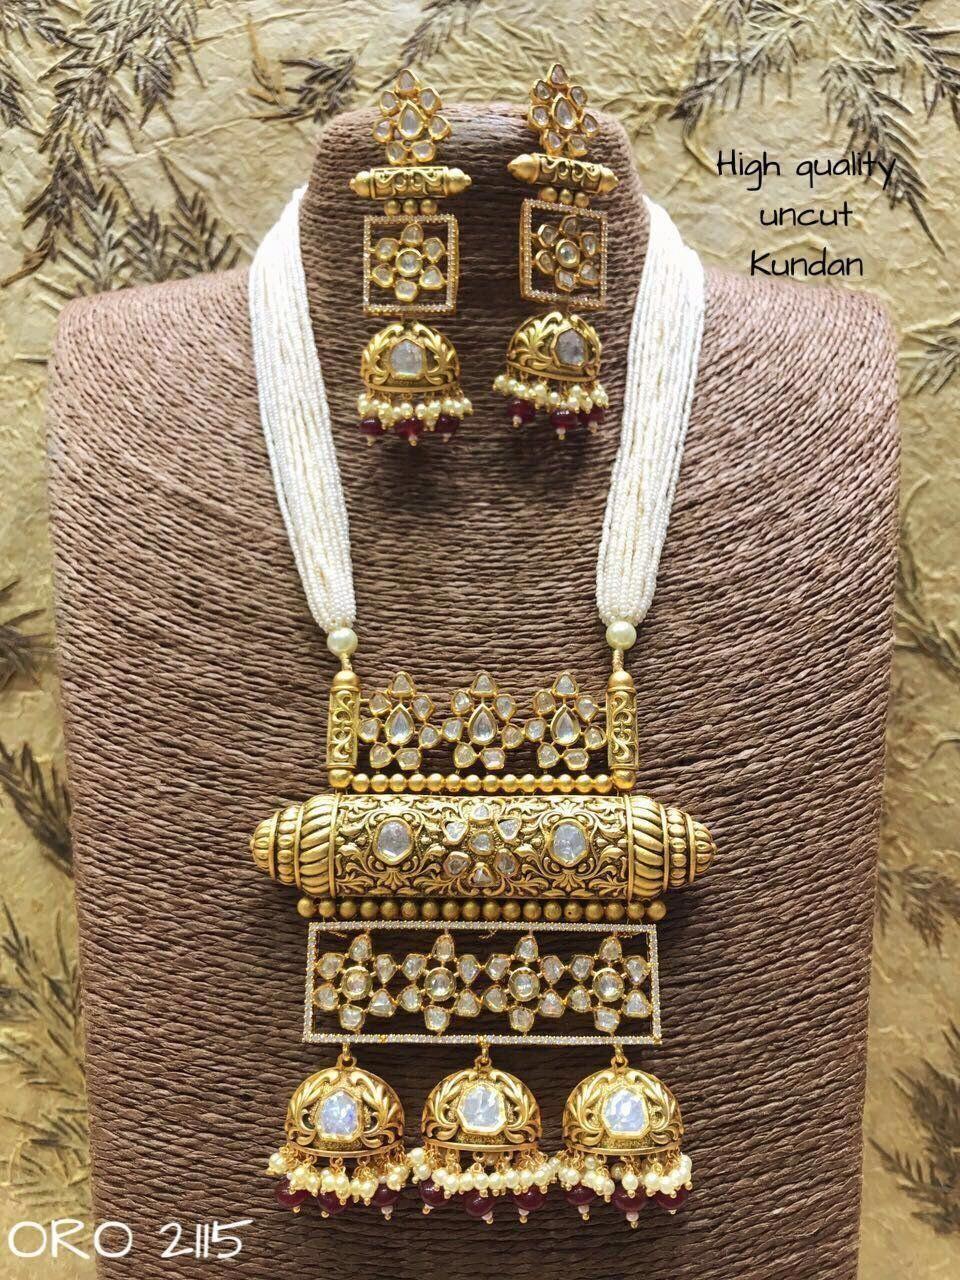 197f68069 Jewellery Sale Debenhams #necklacesdebenhams | Wedding Ring in 2019 ...